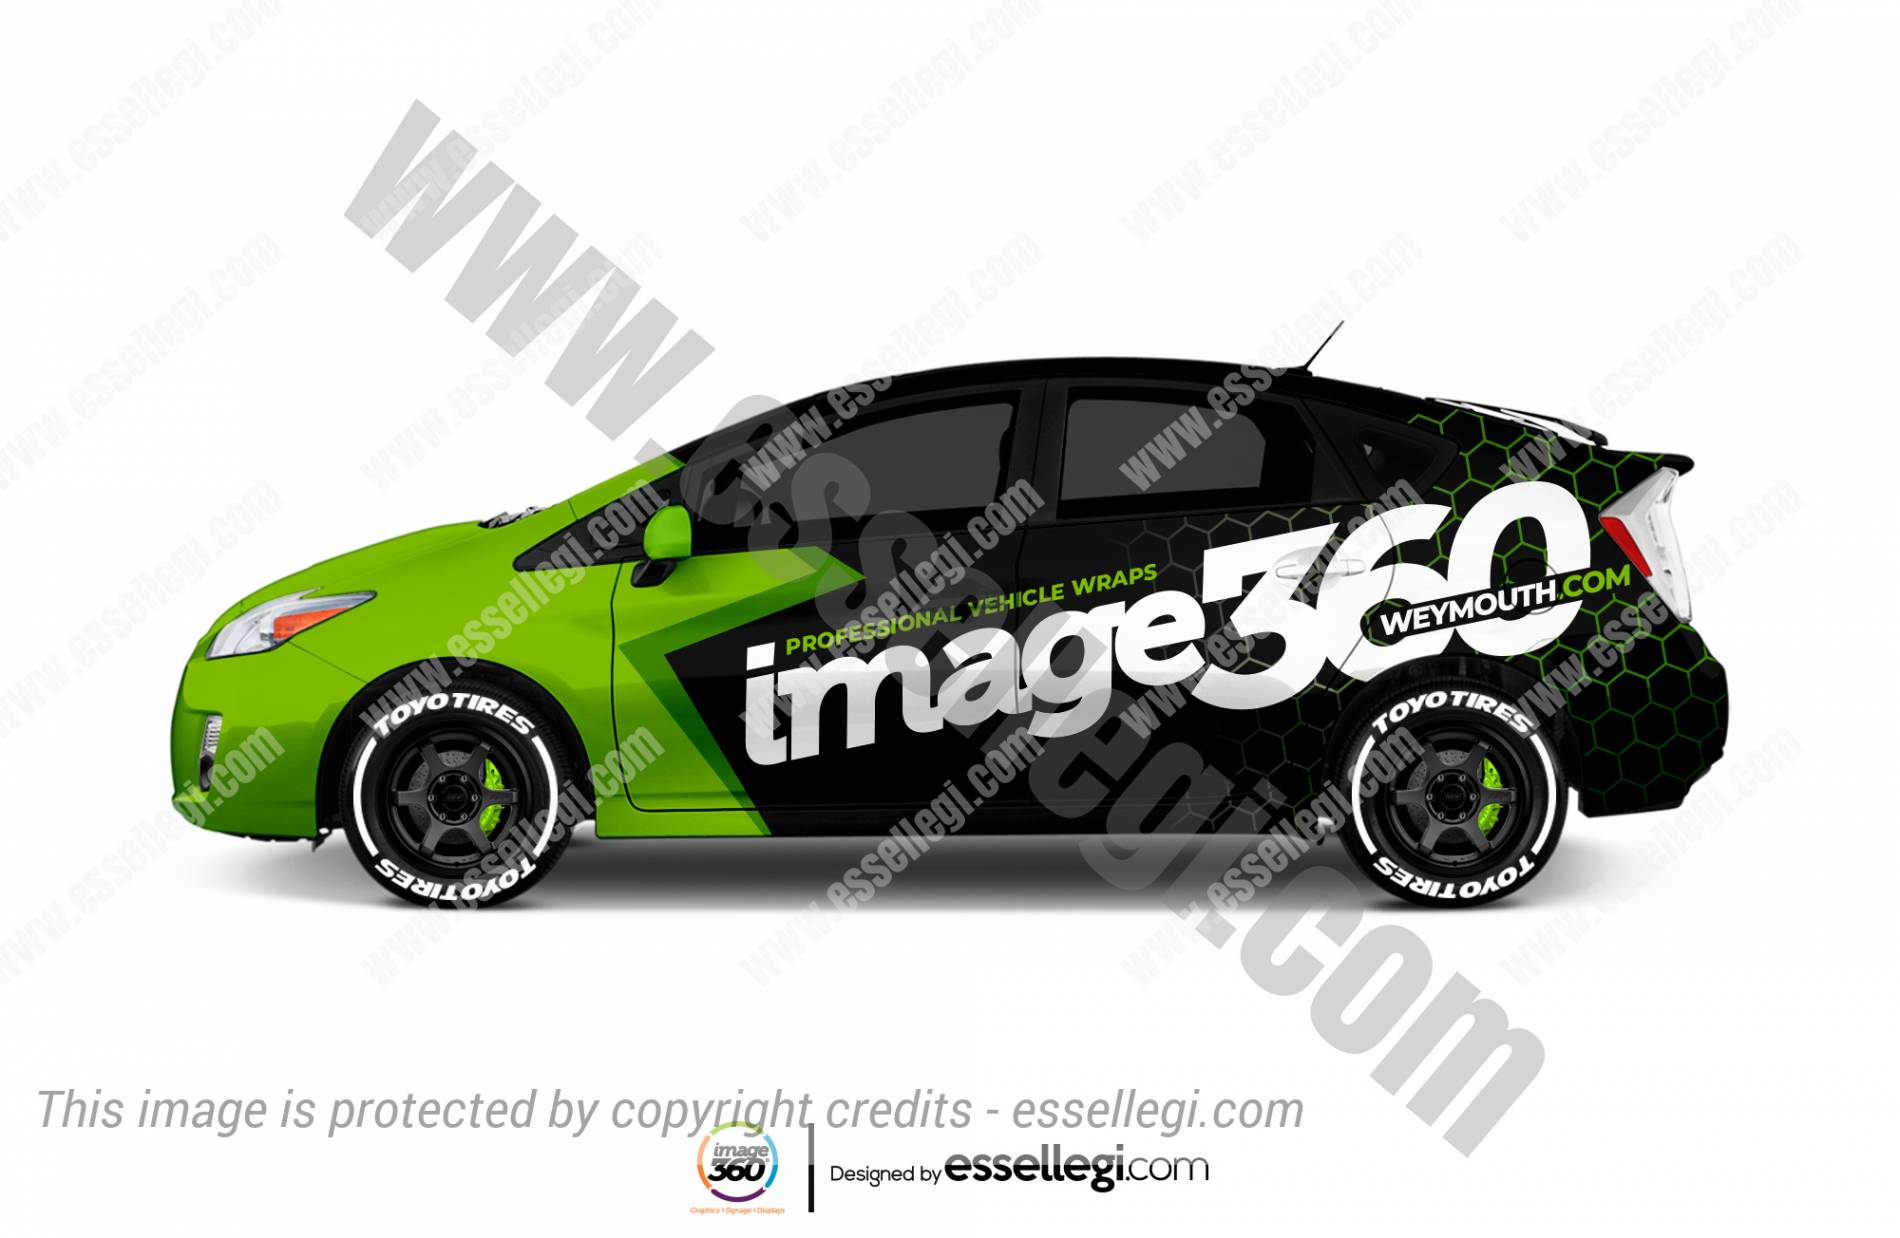 IMAGE360 WEYMOUTH | CAR WRAP DESIGN 🇺🇸